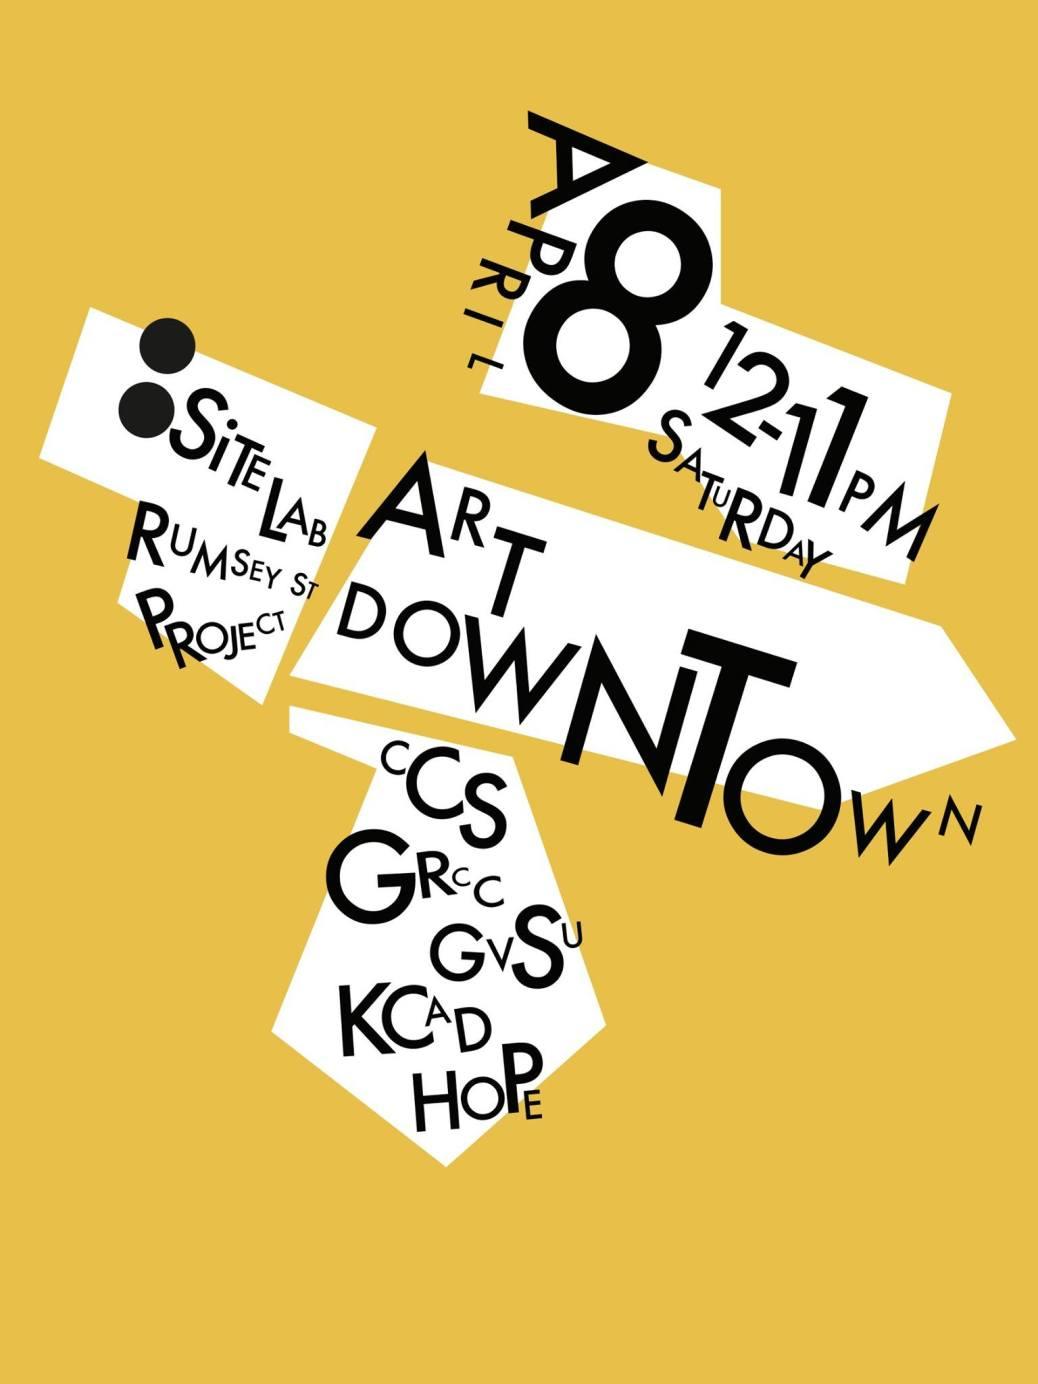 April 8 12-11 p.m. Saturday Site:Lab Rumsey St. Project. Art Downtown. CCS, GRCC, GVSU, KCAD, Hope.